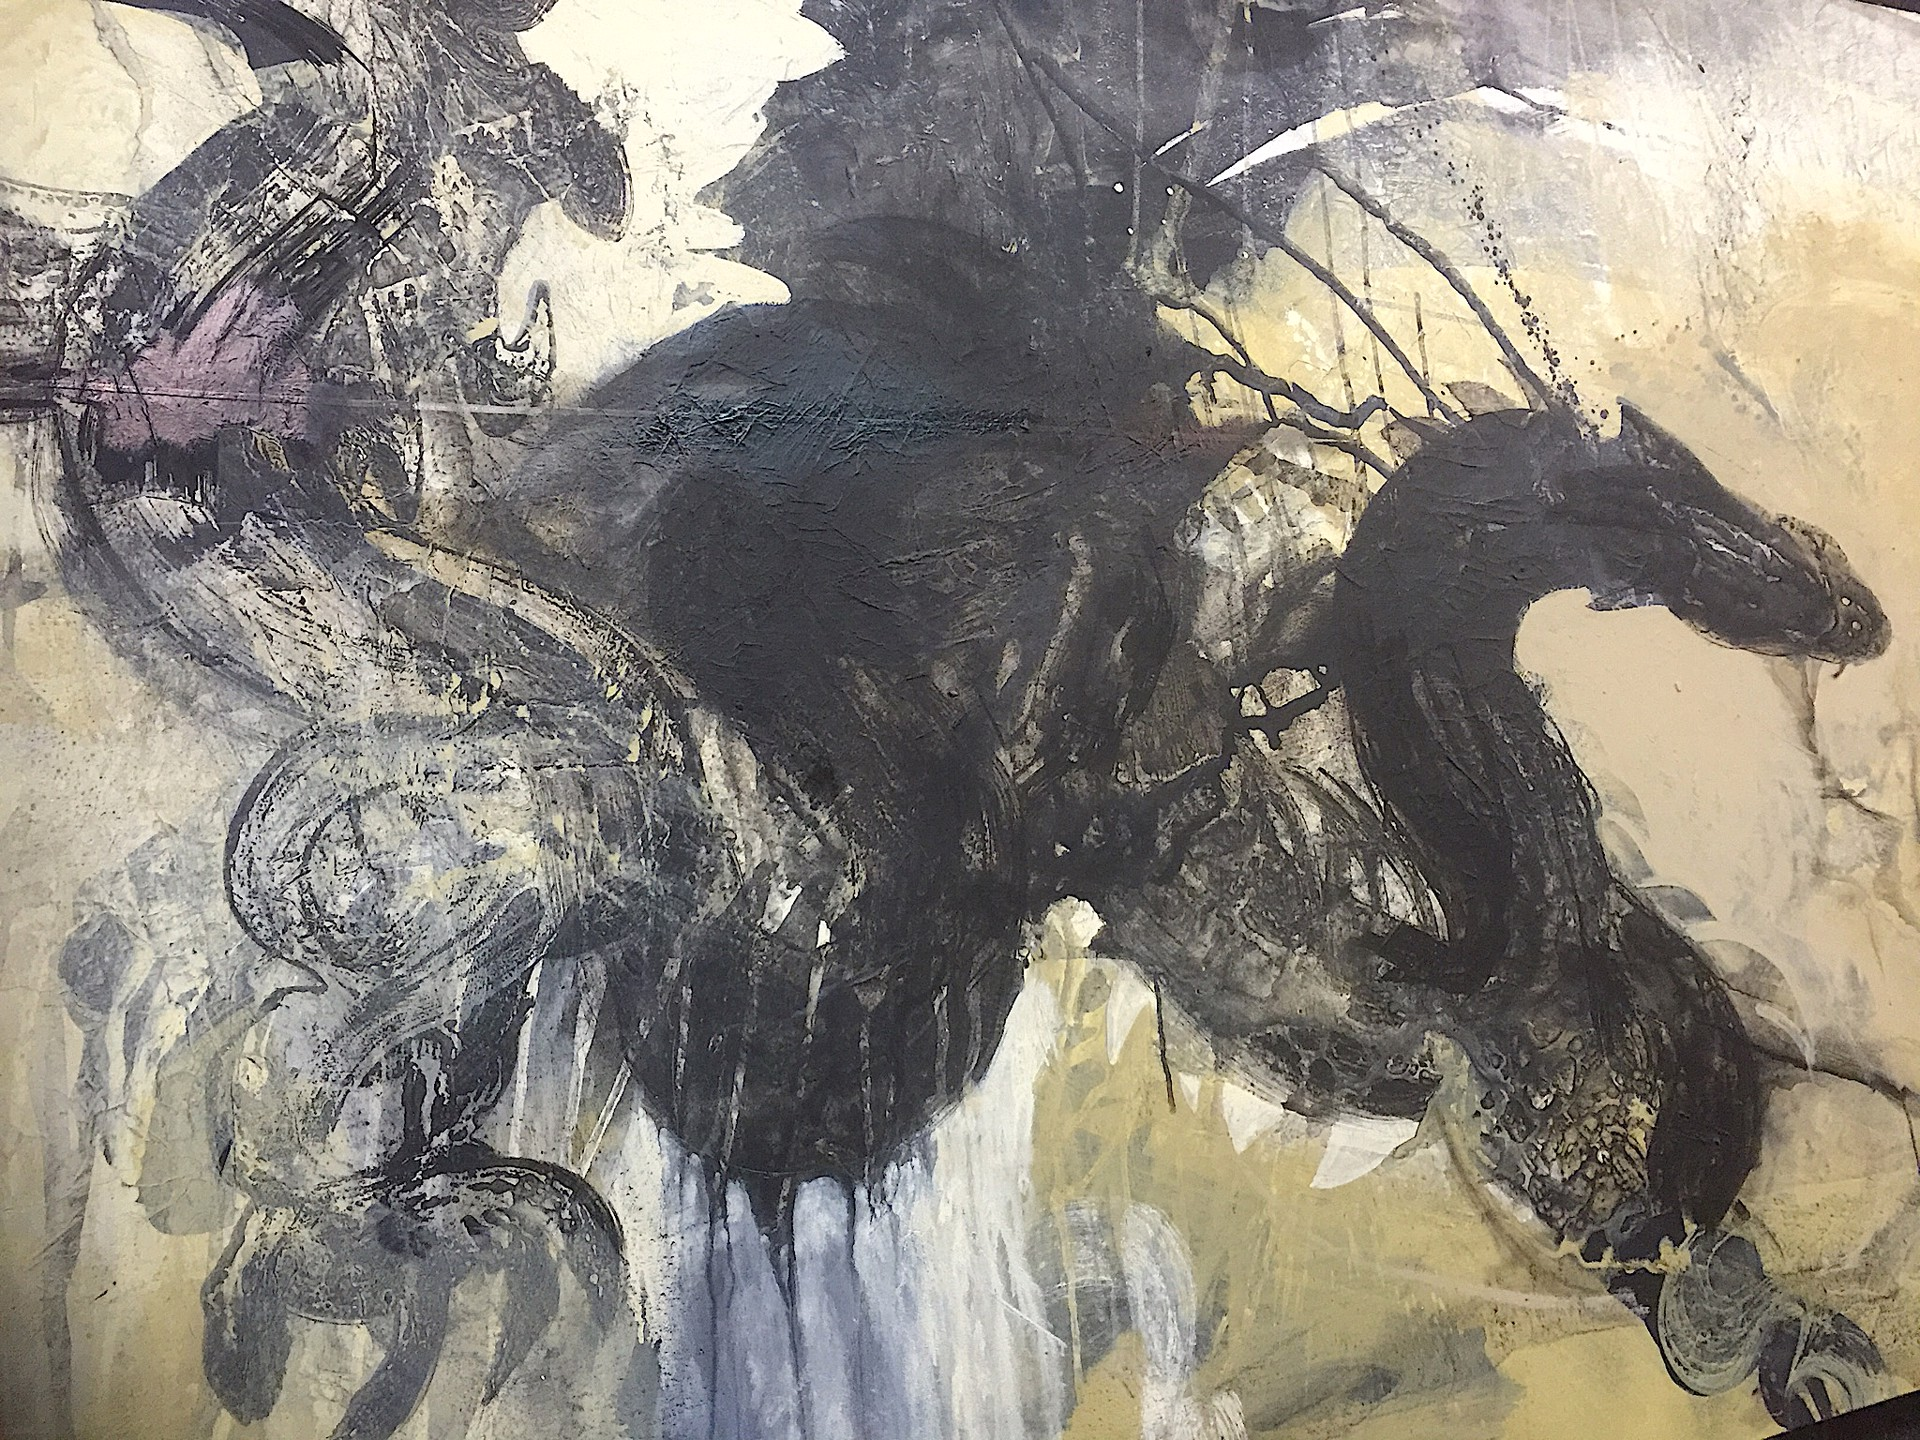 Dragon by Chrissy Dolan-Terrasi